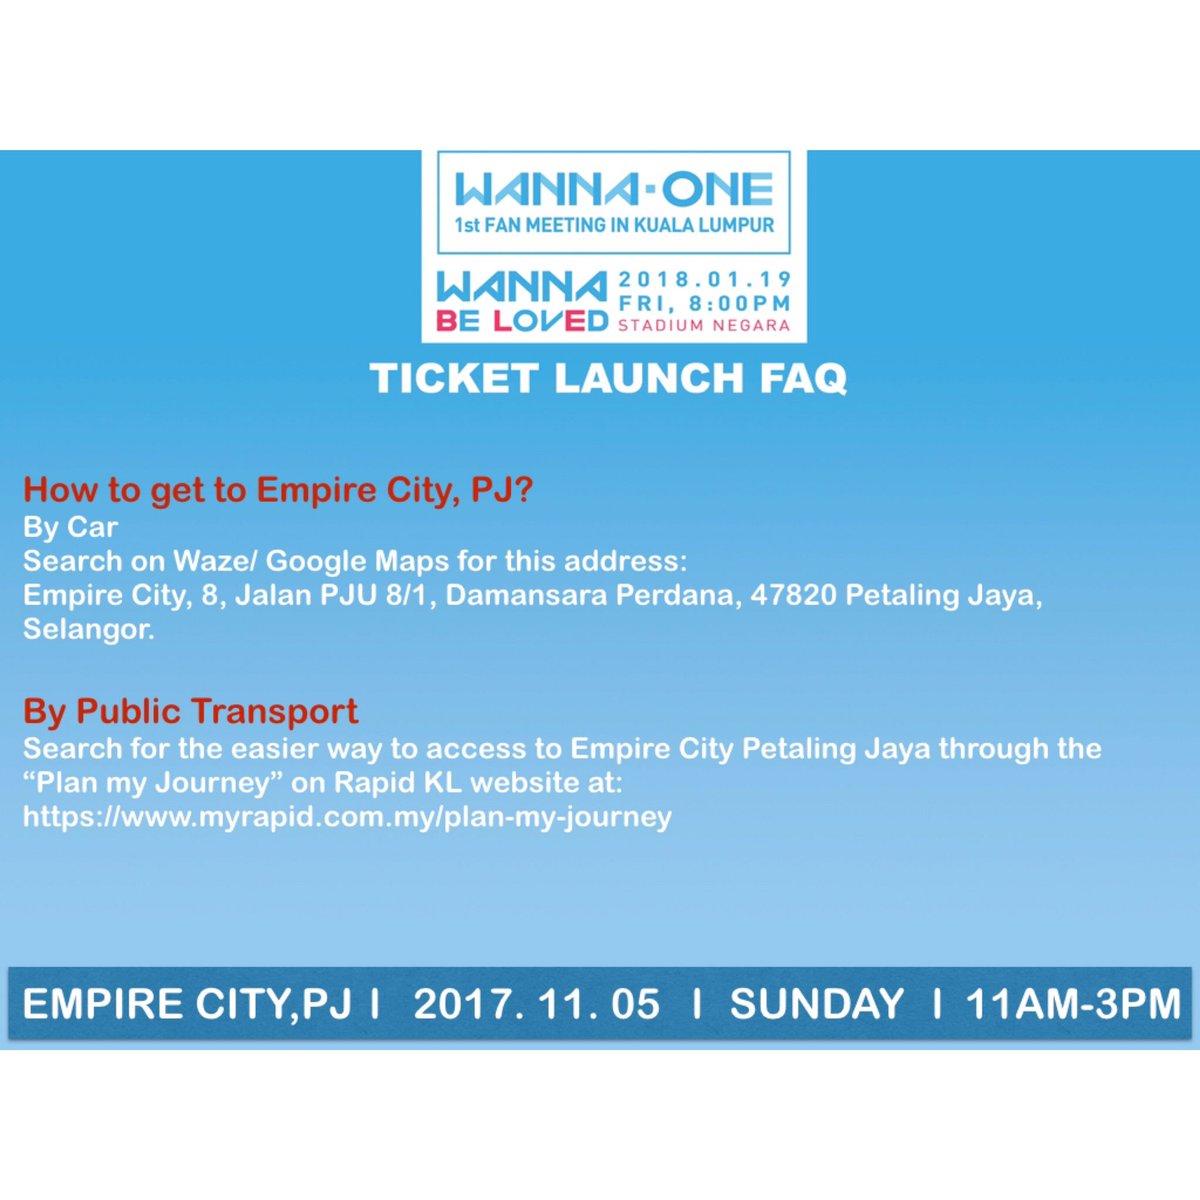 Ime My On Twitter Wanna One 1st Fan Meeting In Kuala Lumpur Wanna Be Loved Ticket Launch Faq 05112017 11 00am Empire City Pj Wannaoneinkl Wannaone Https T Co H7dax37knk